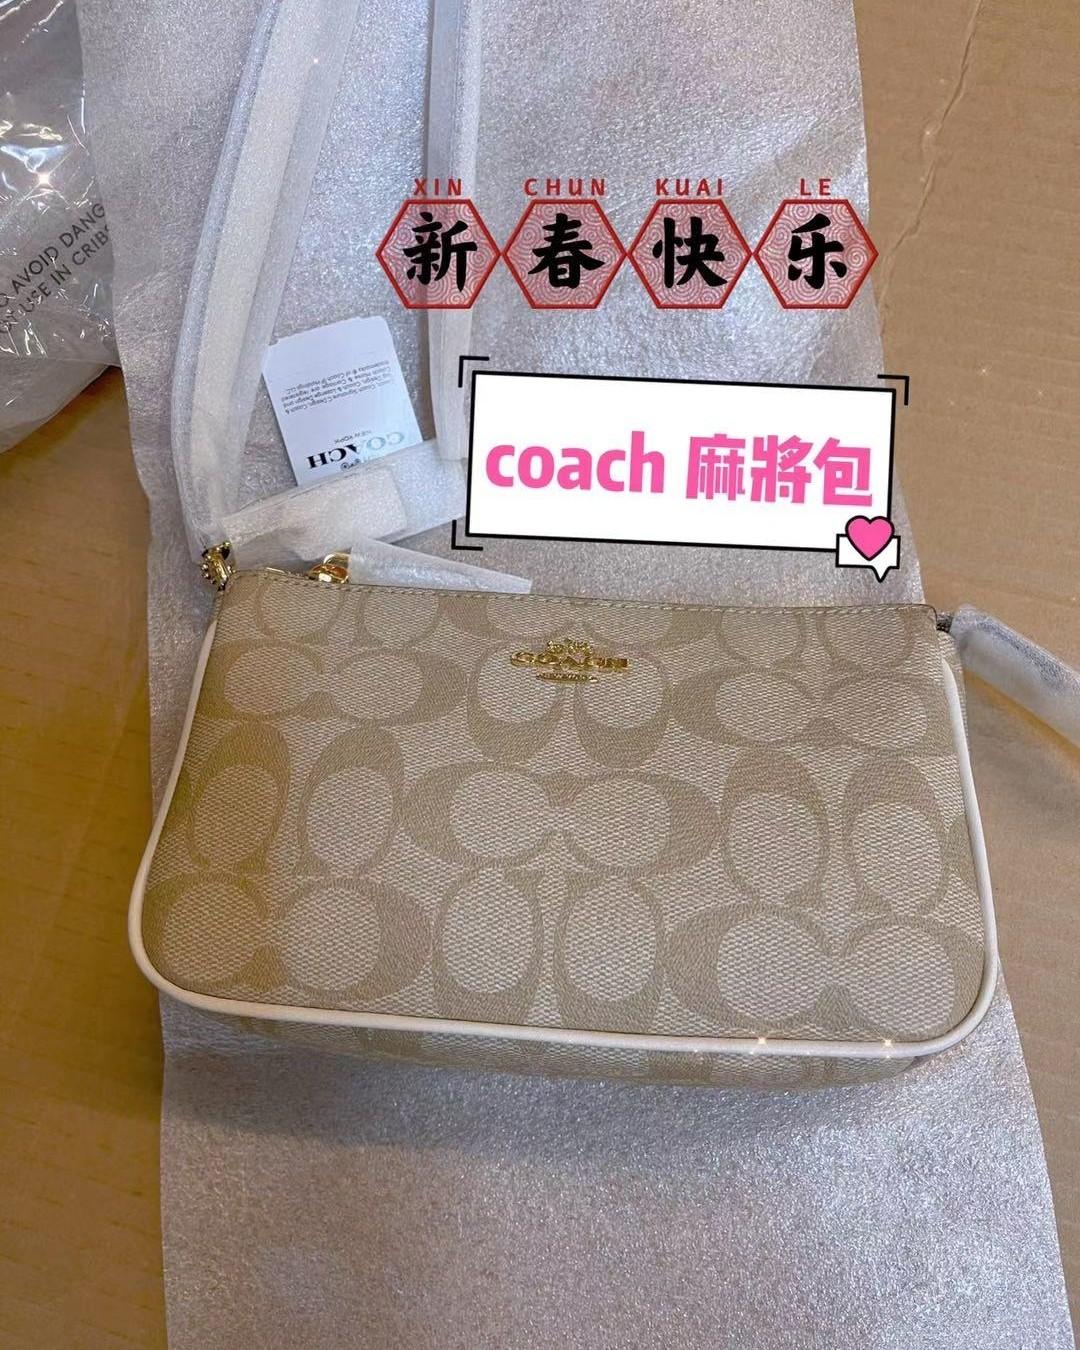 Coach新款超流行的款式,太可爱  买到绝对赚到! !可以